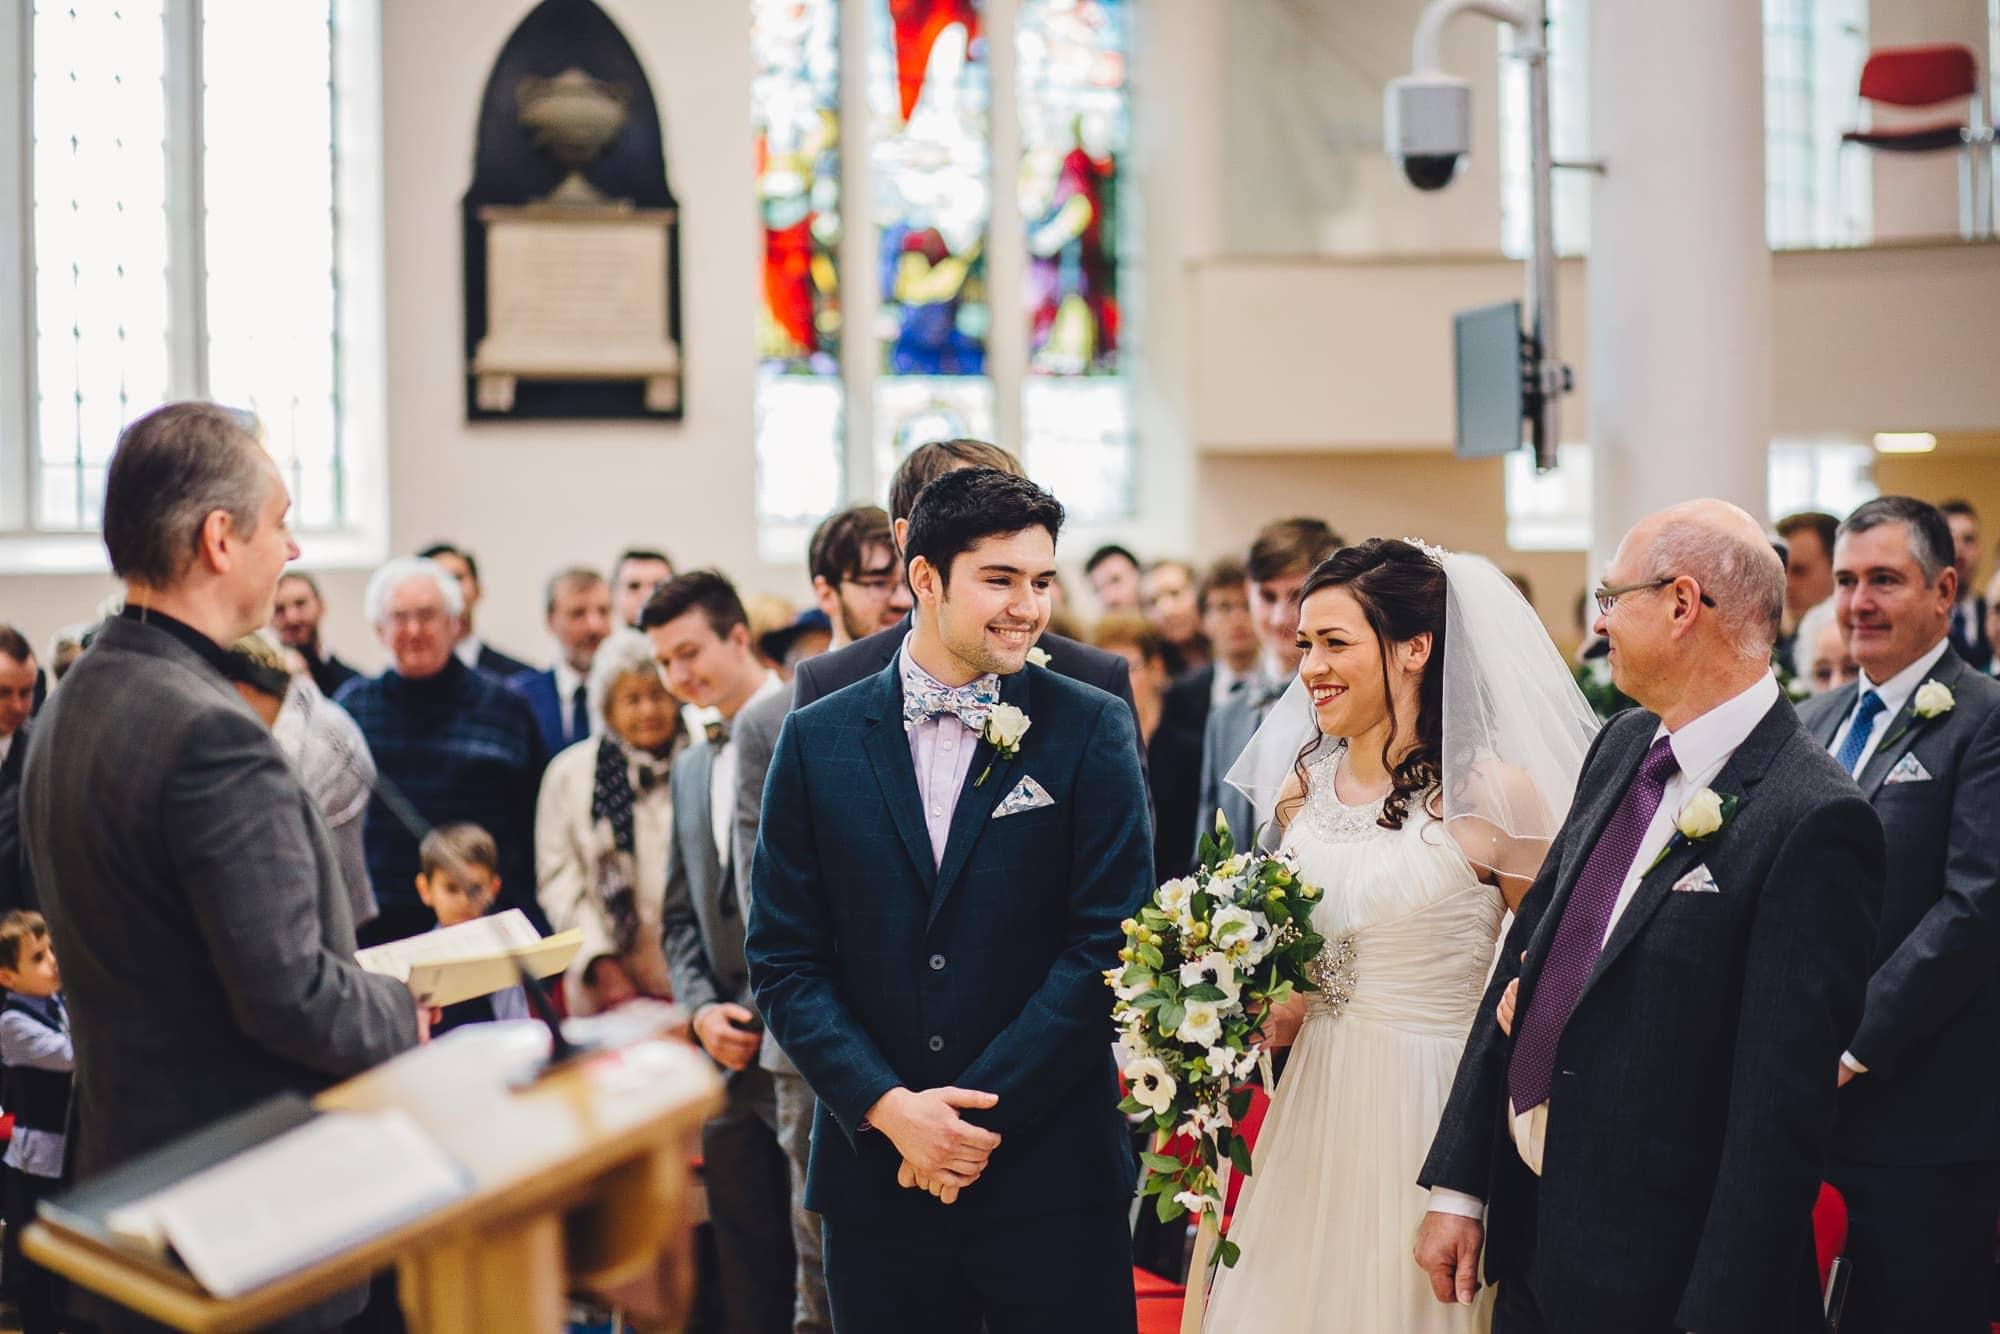 Matlt-Cross-Nottingham-wedding-Photography-27